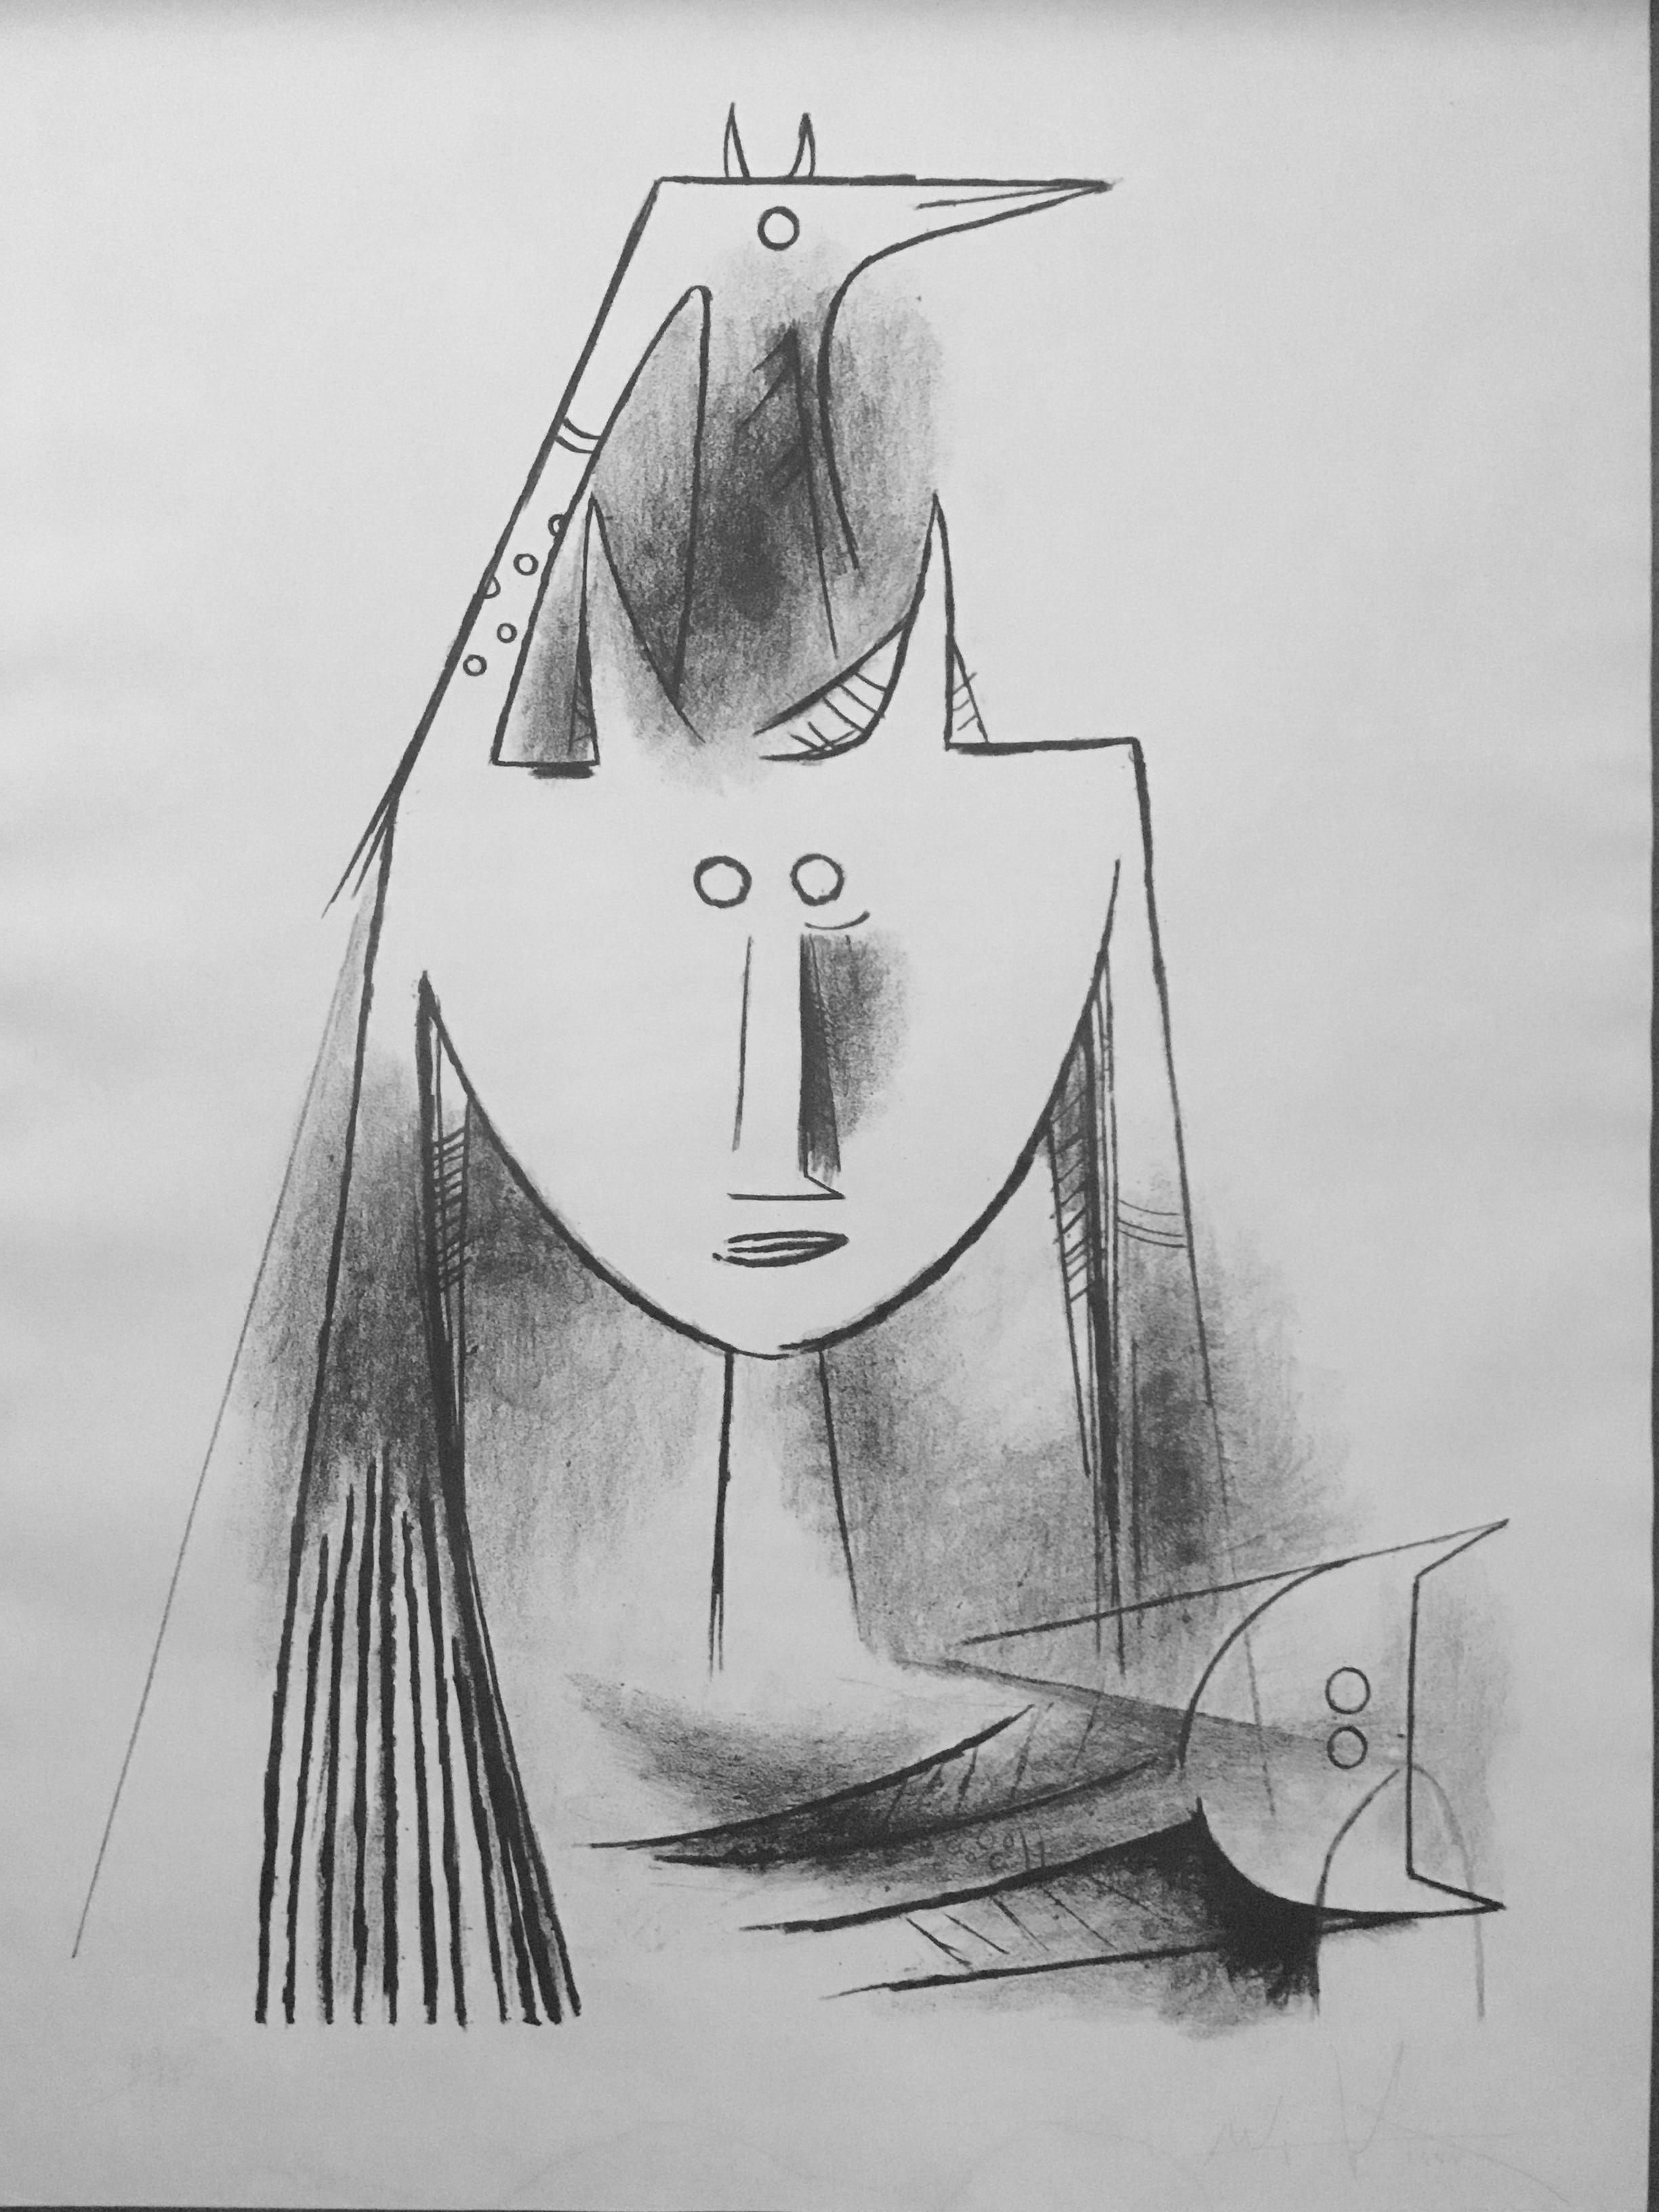 Primitiv Gestalt (5501), Lithograph by Wifredo Lam 1956